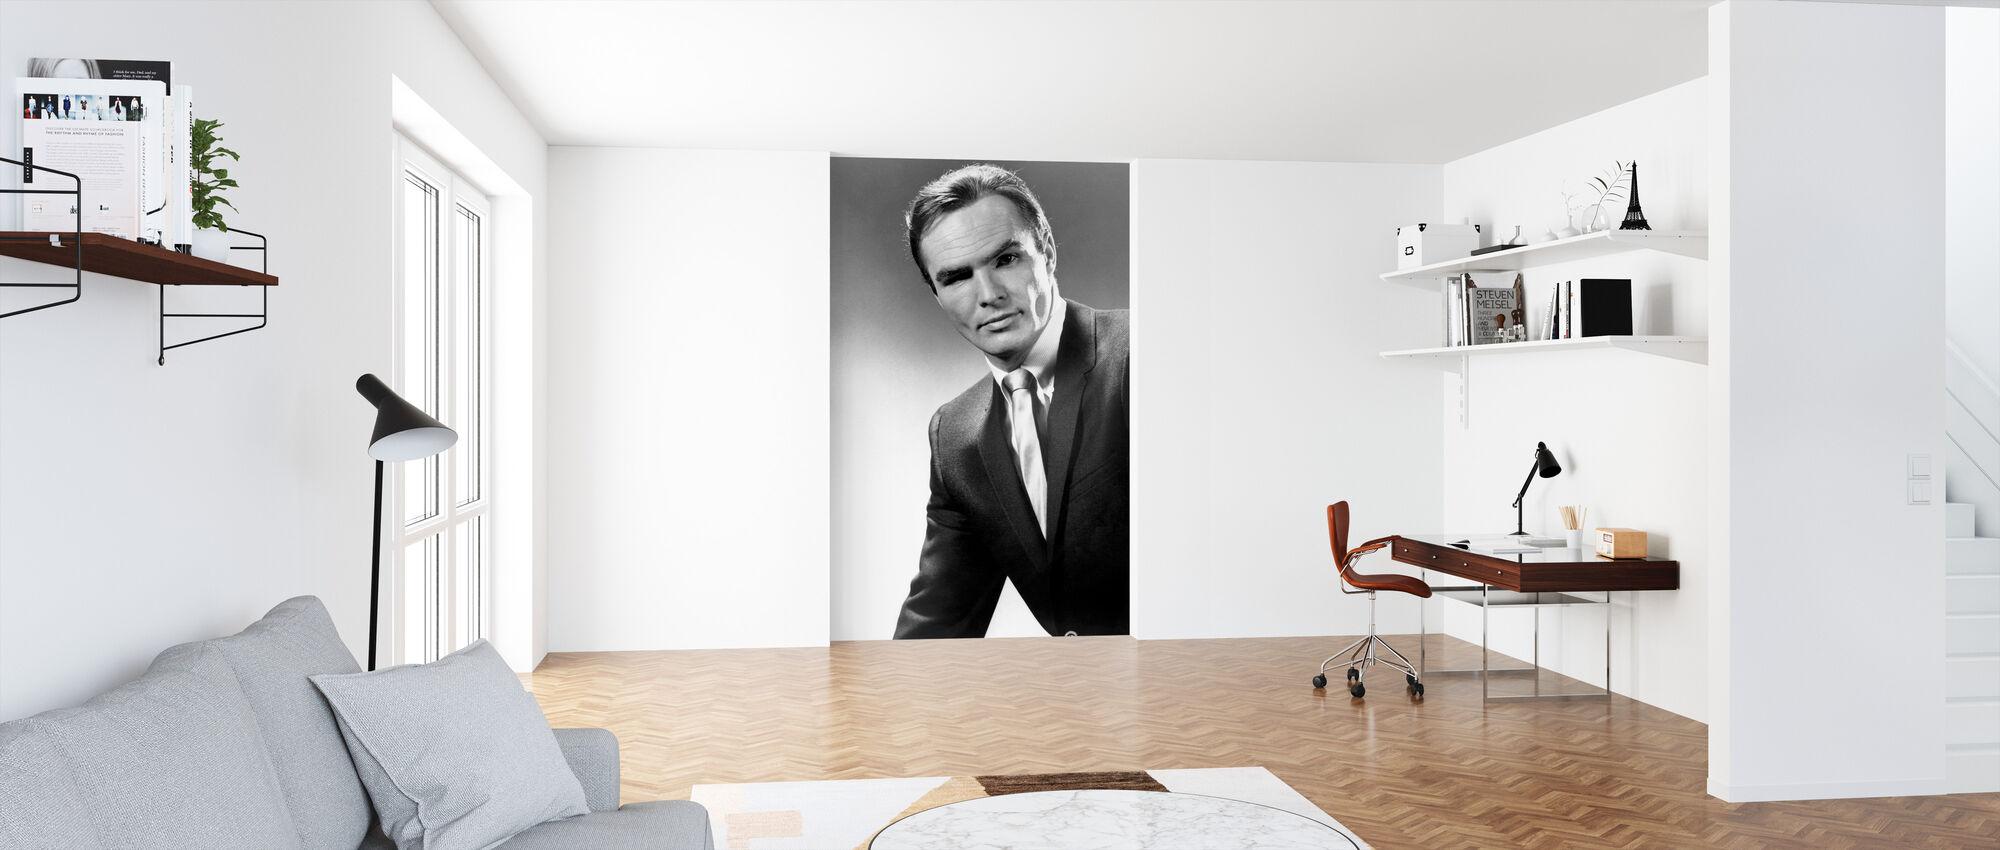 Dan August - Wallpaper - Office